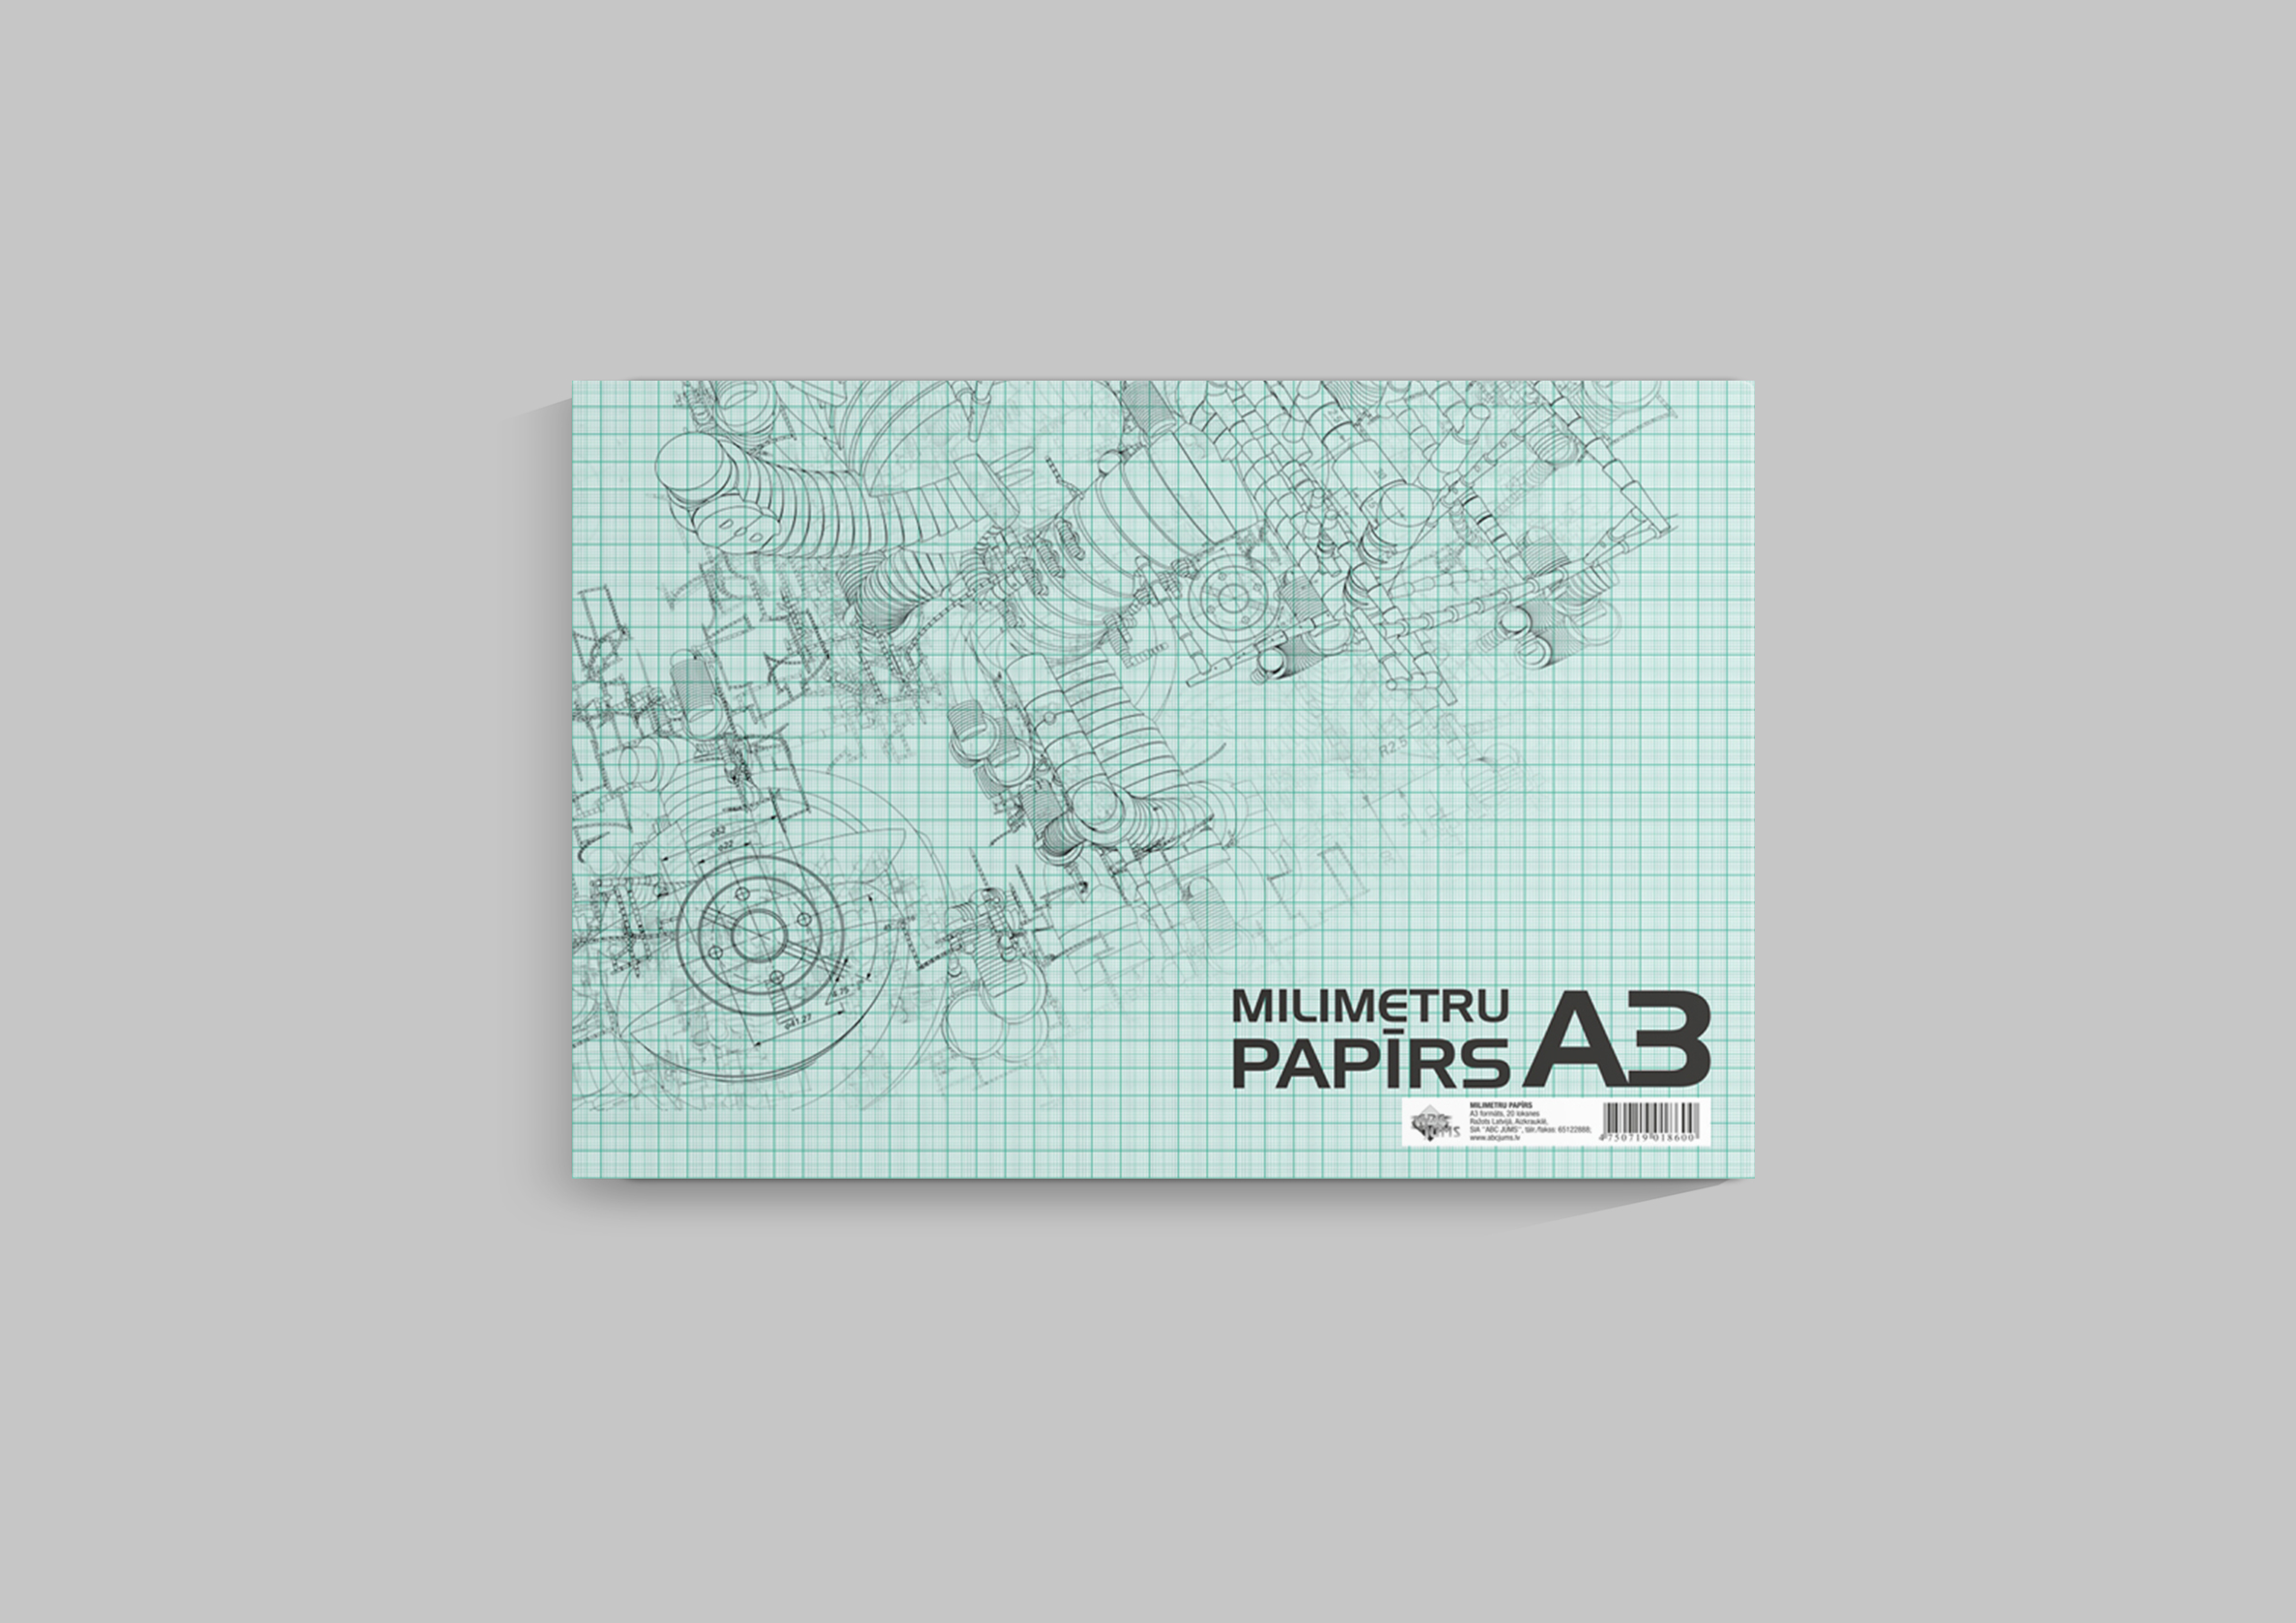 papira_bloki_1860